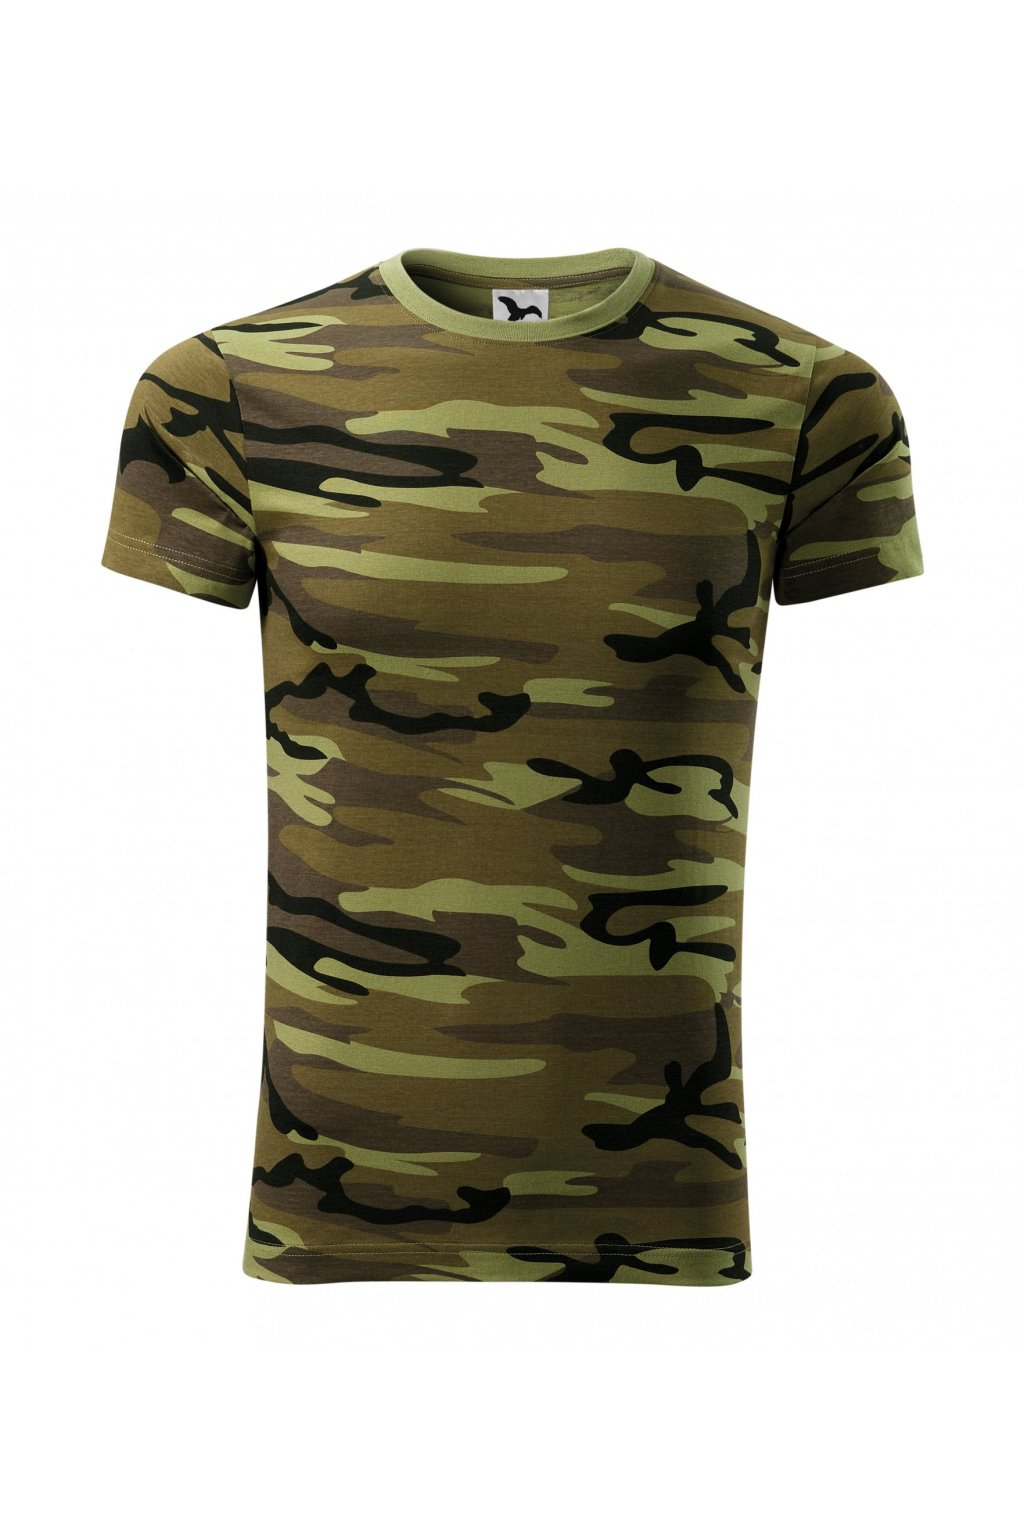 Camouflage 144 Tričko unisex